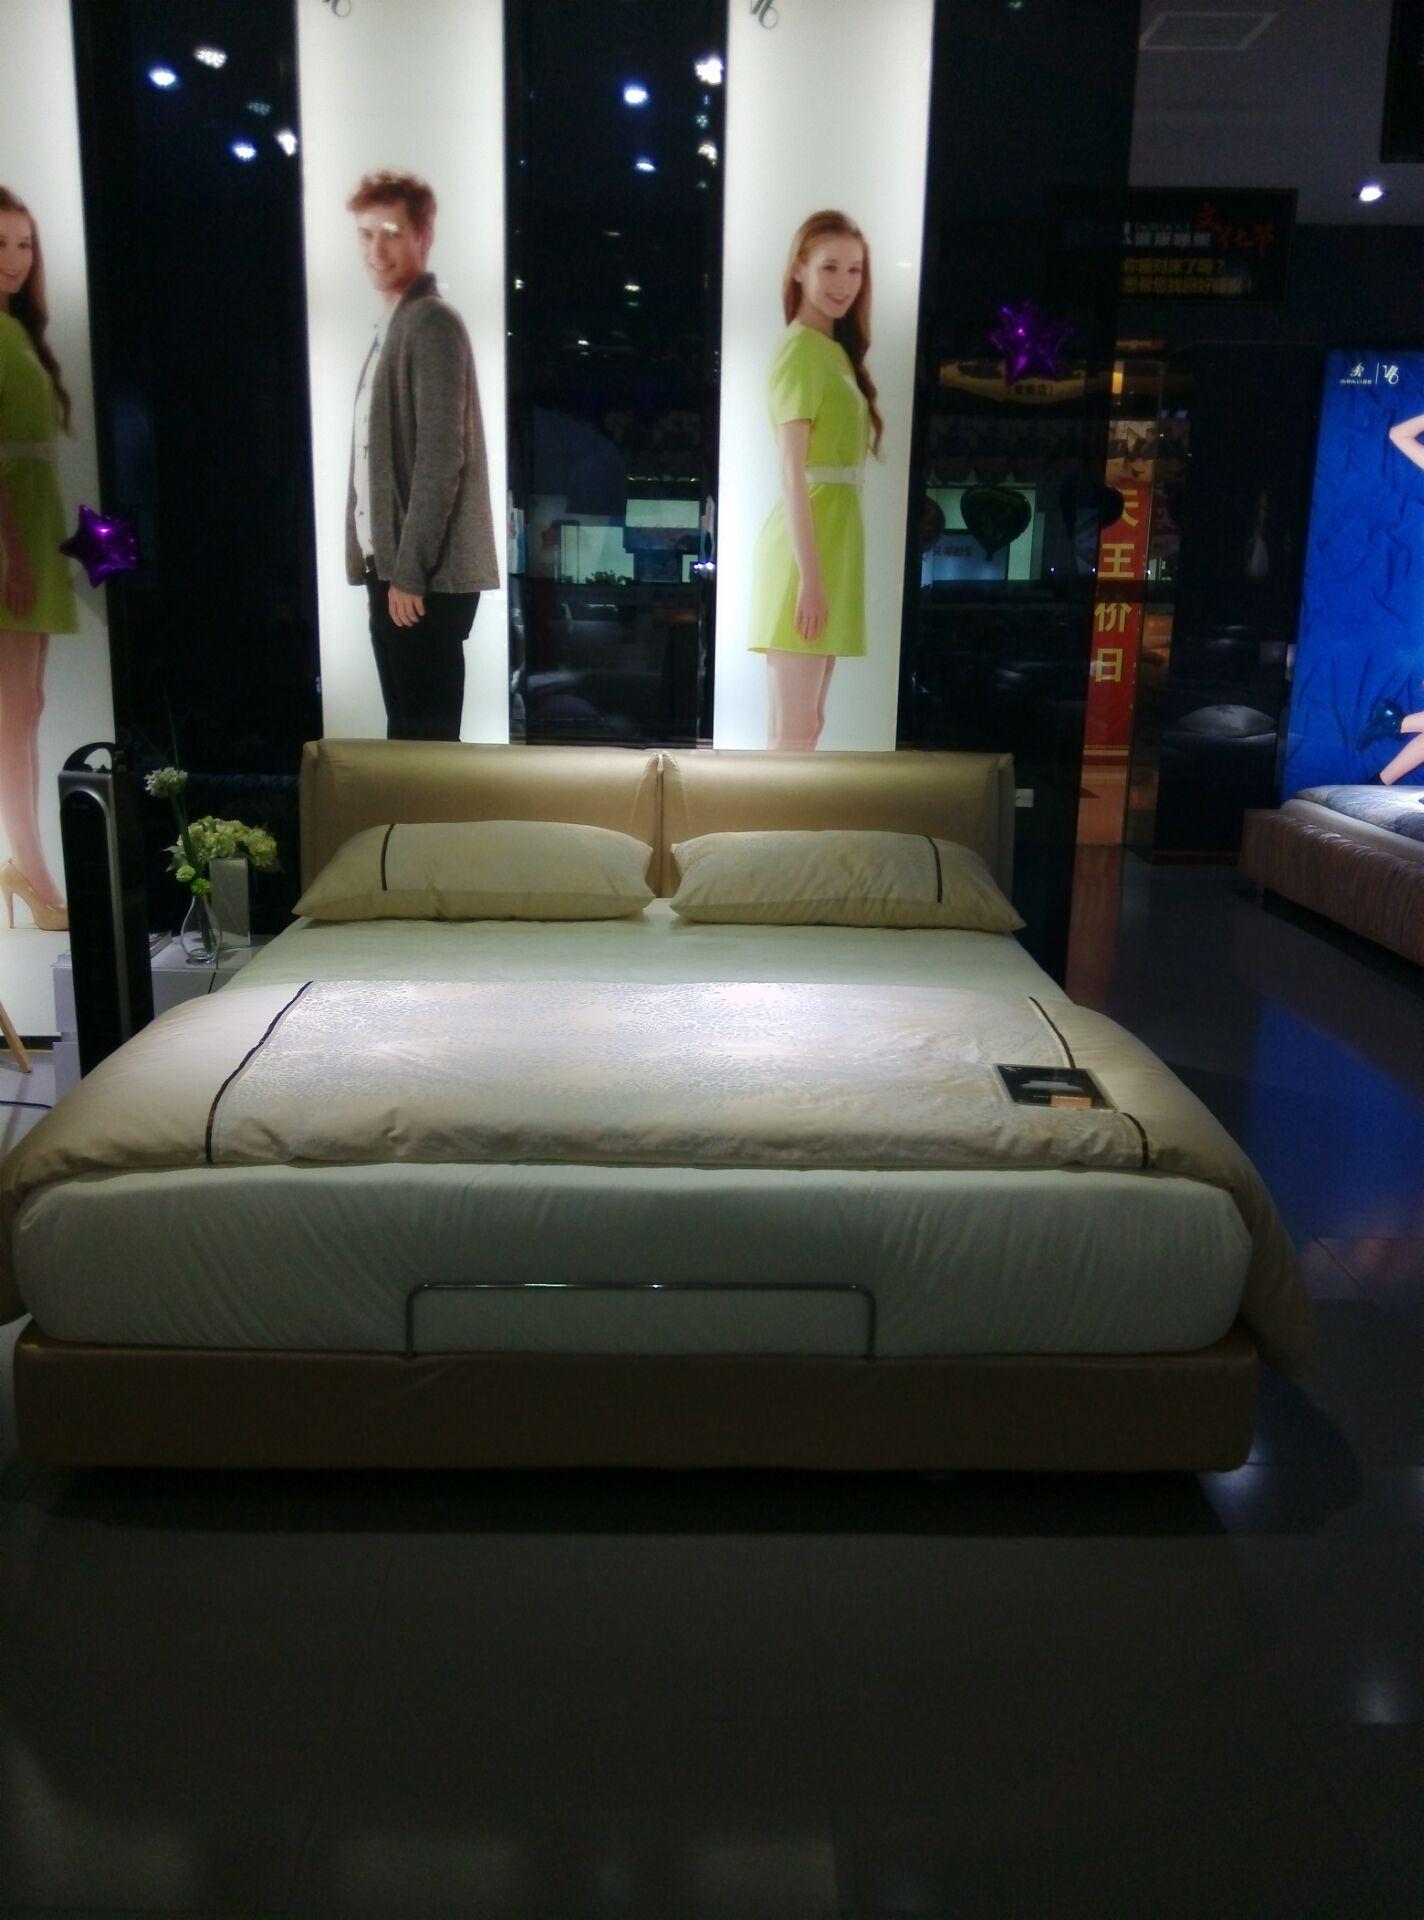 VB-100标准床架+V-2排骨架+1V床垫(不含床品)